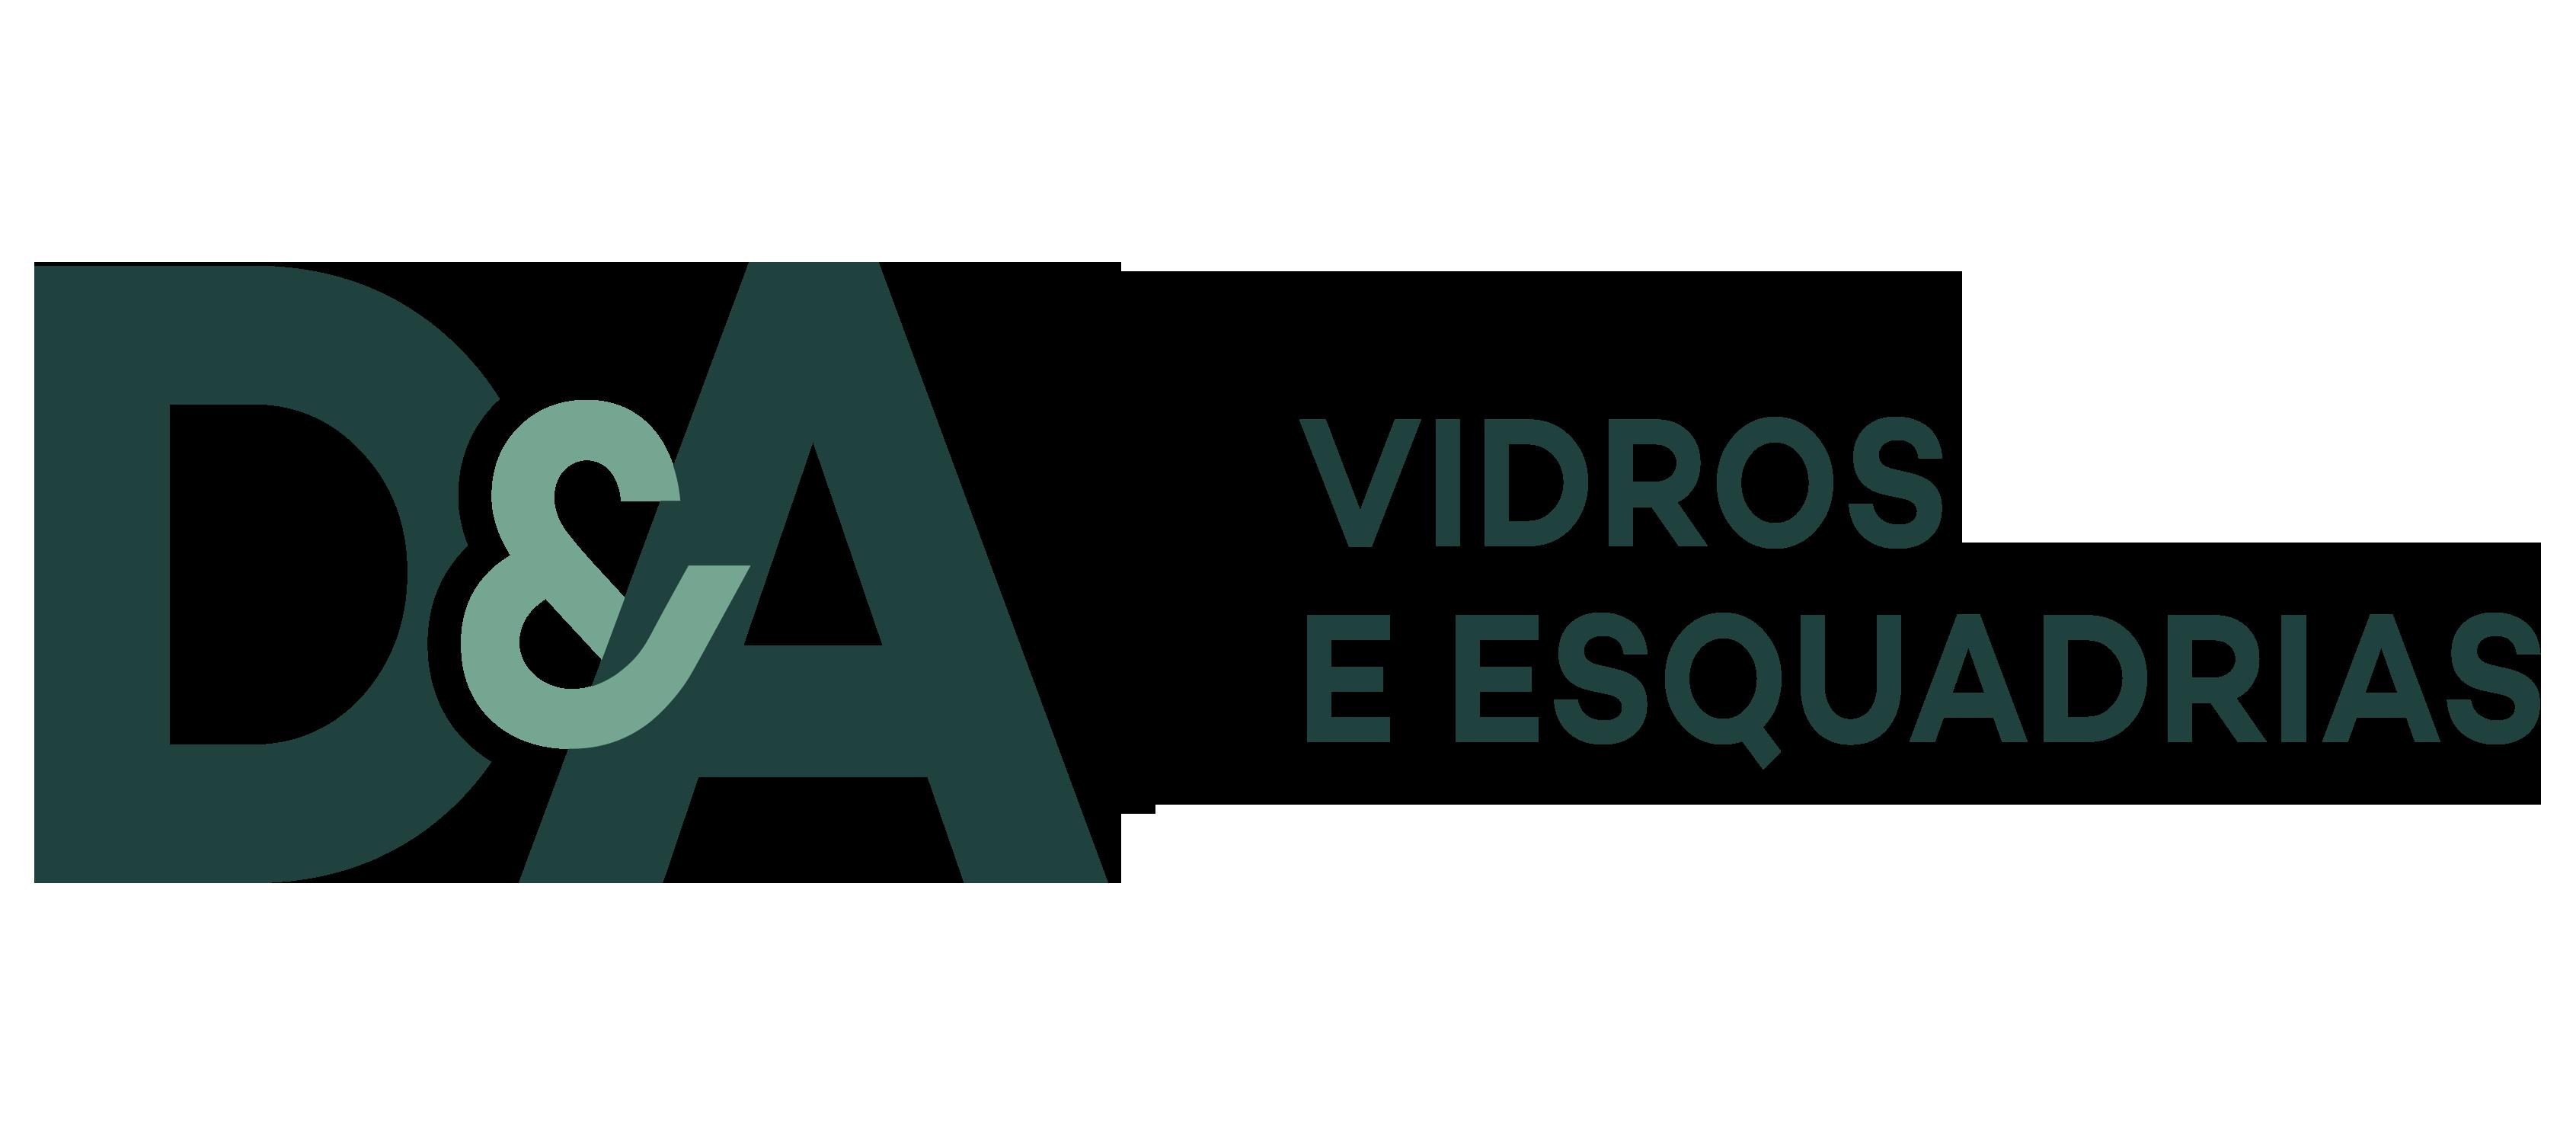 D&A Vidros